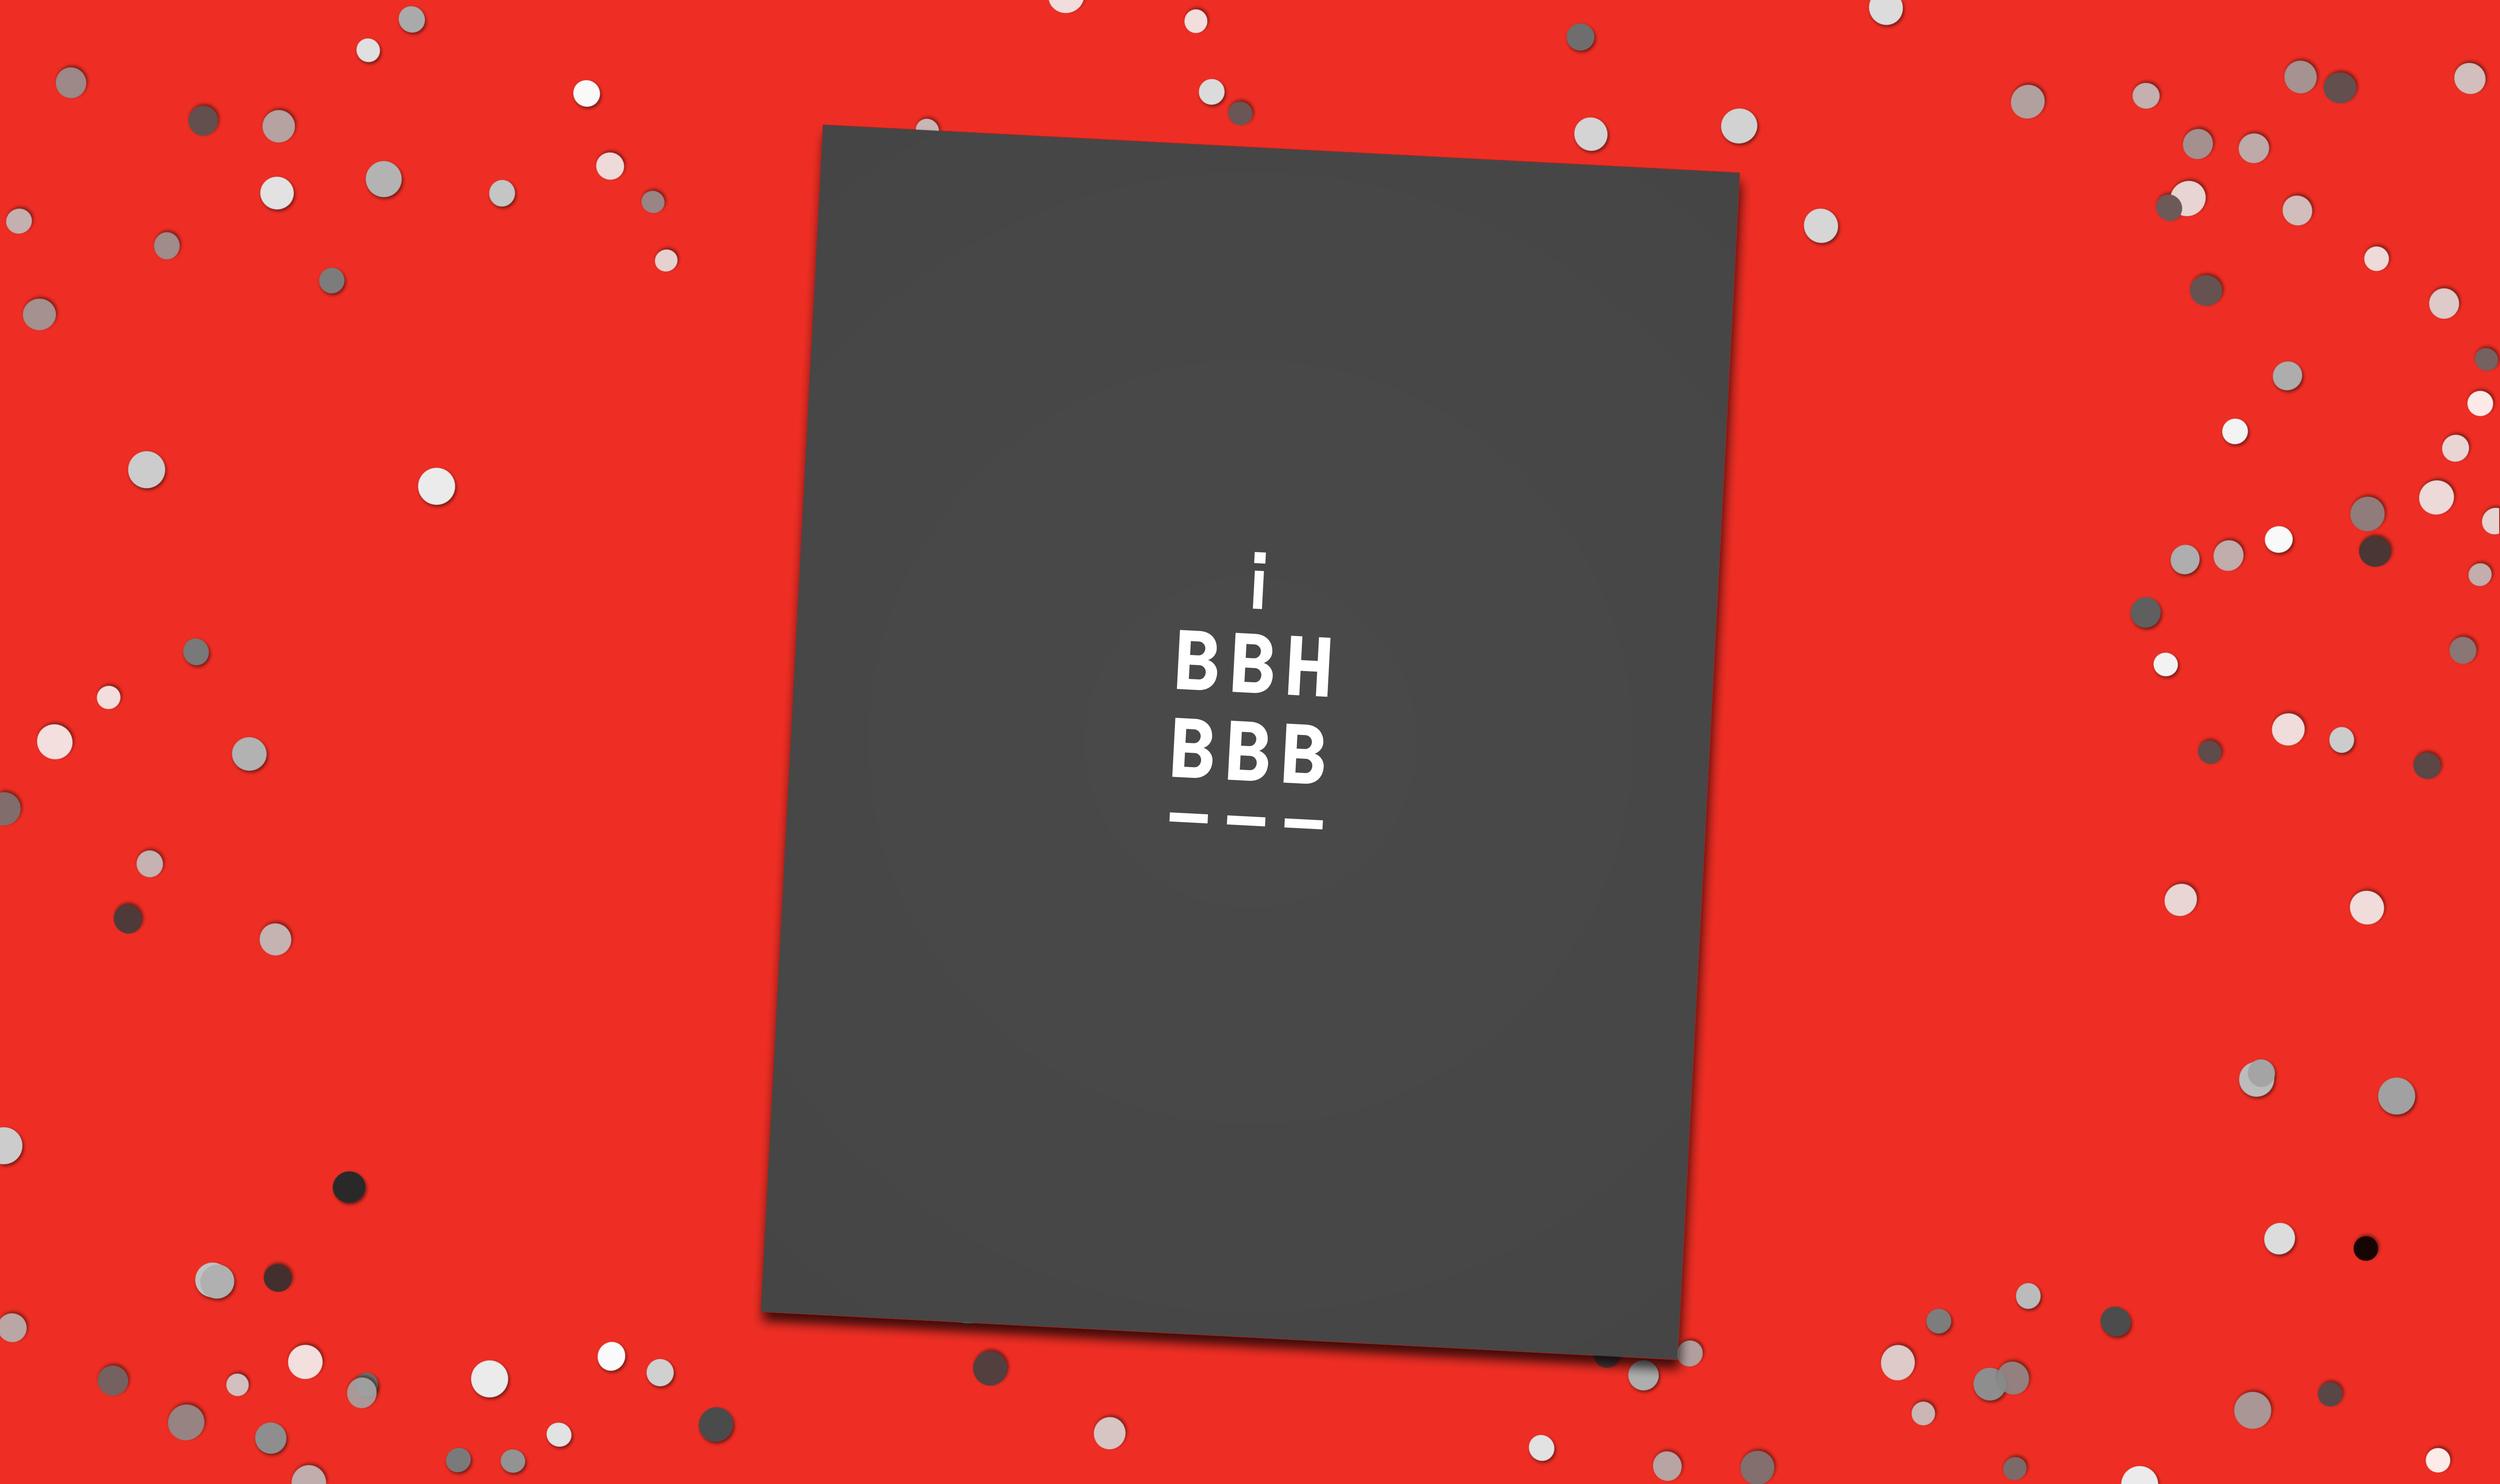 BBB_Spreads_v2-5.jpg